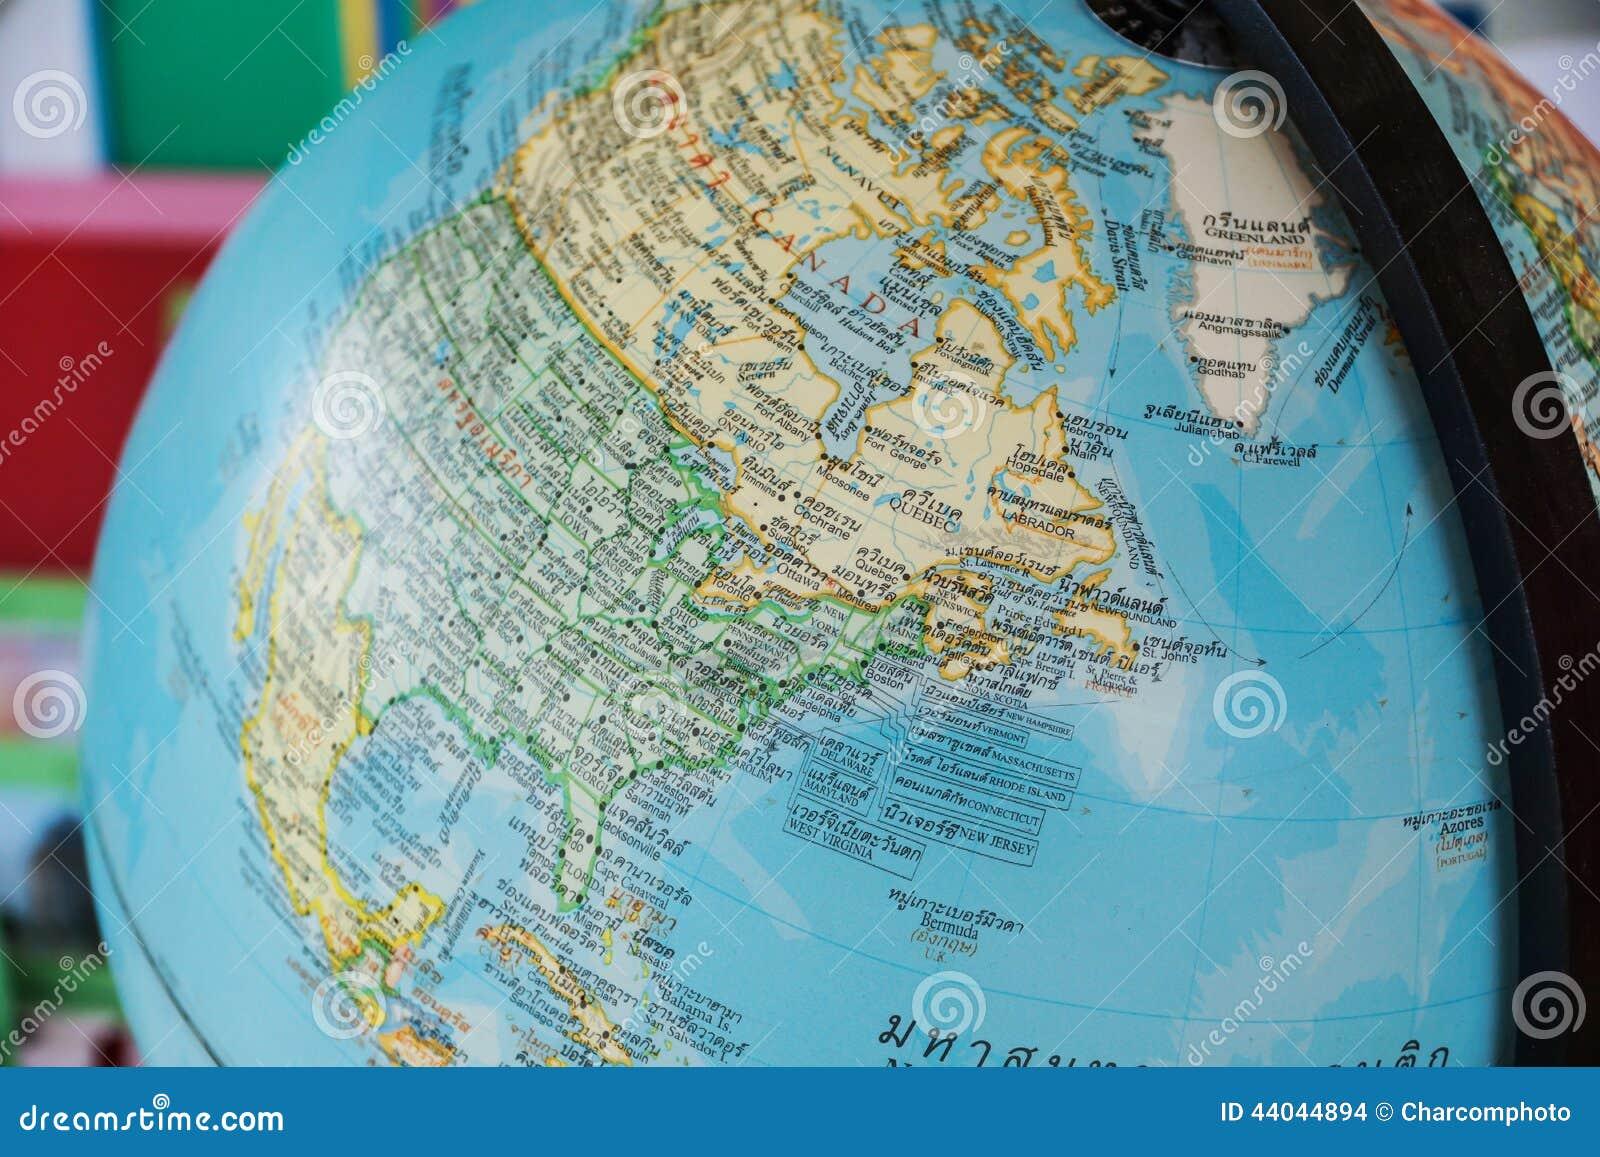 Spherical World Map.World Globe Map Background Stock Photo Image Of Business 44044894